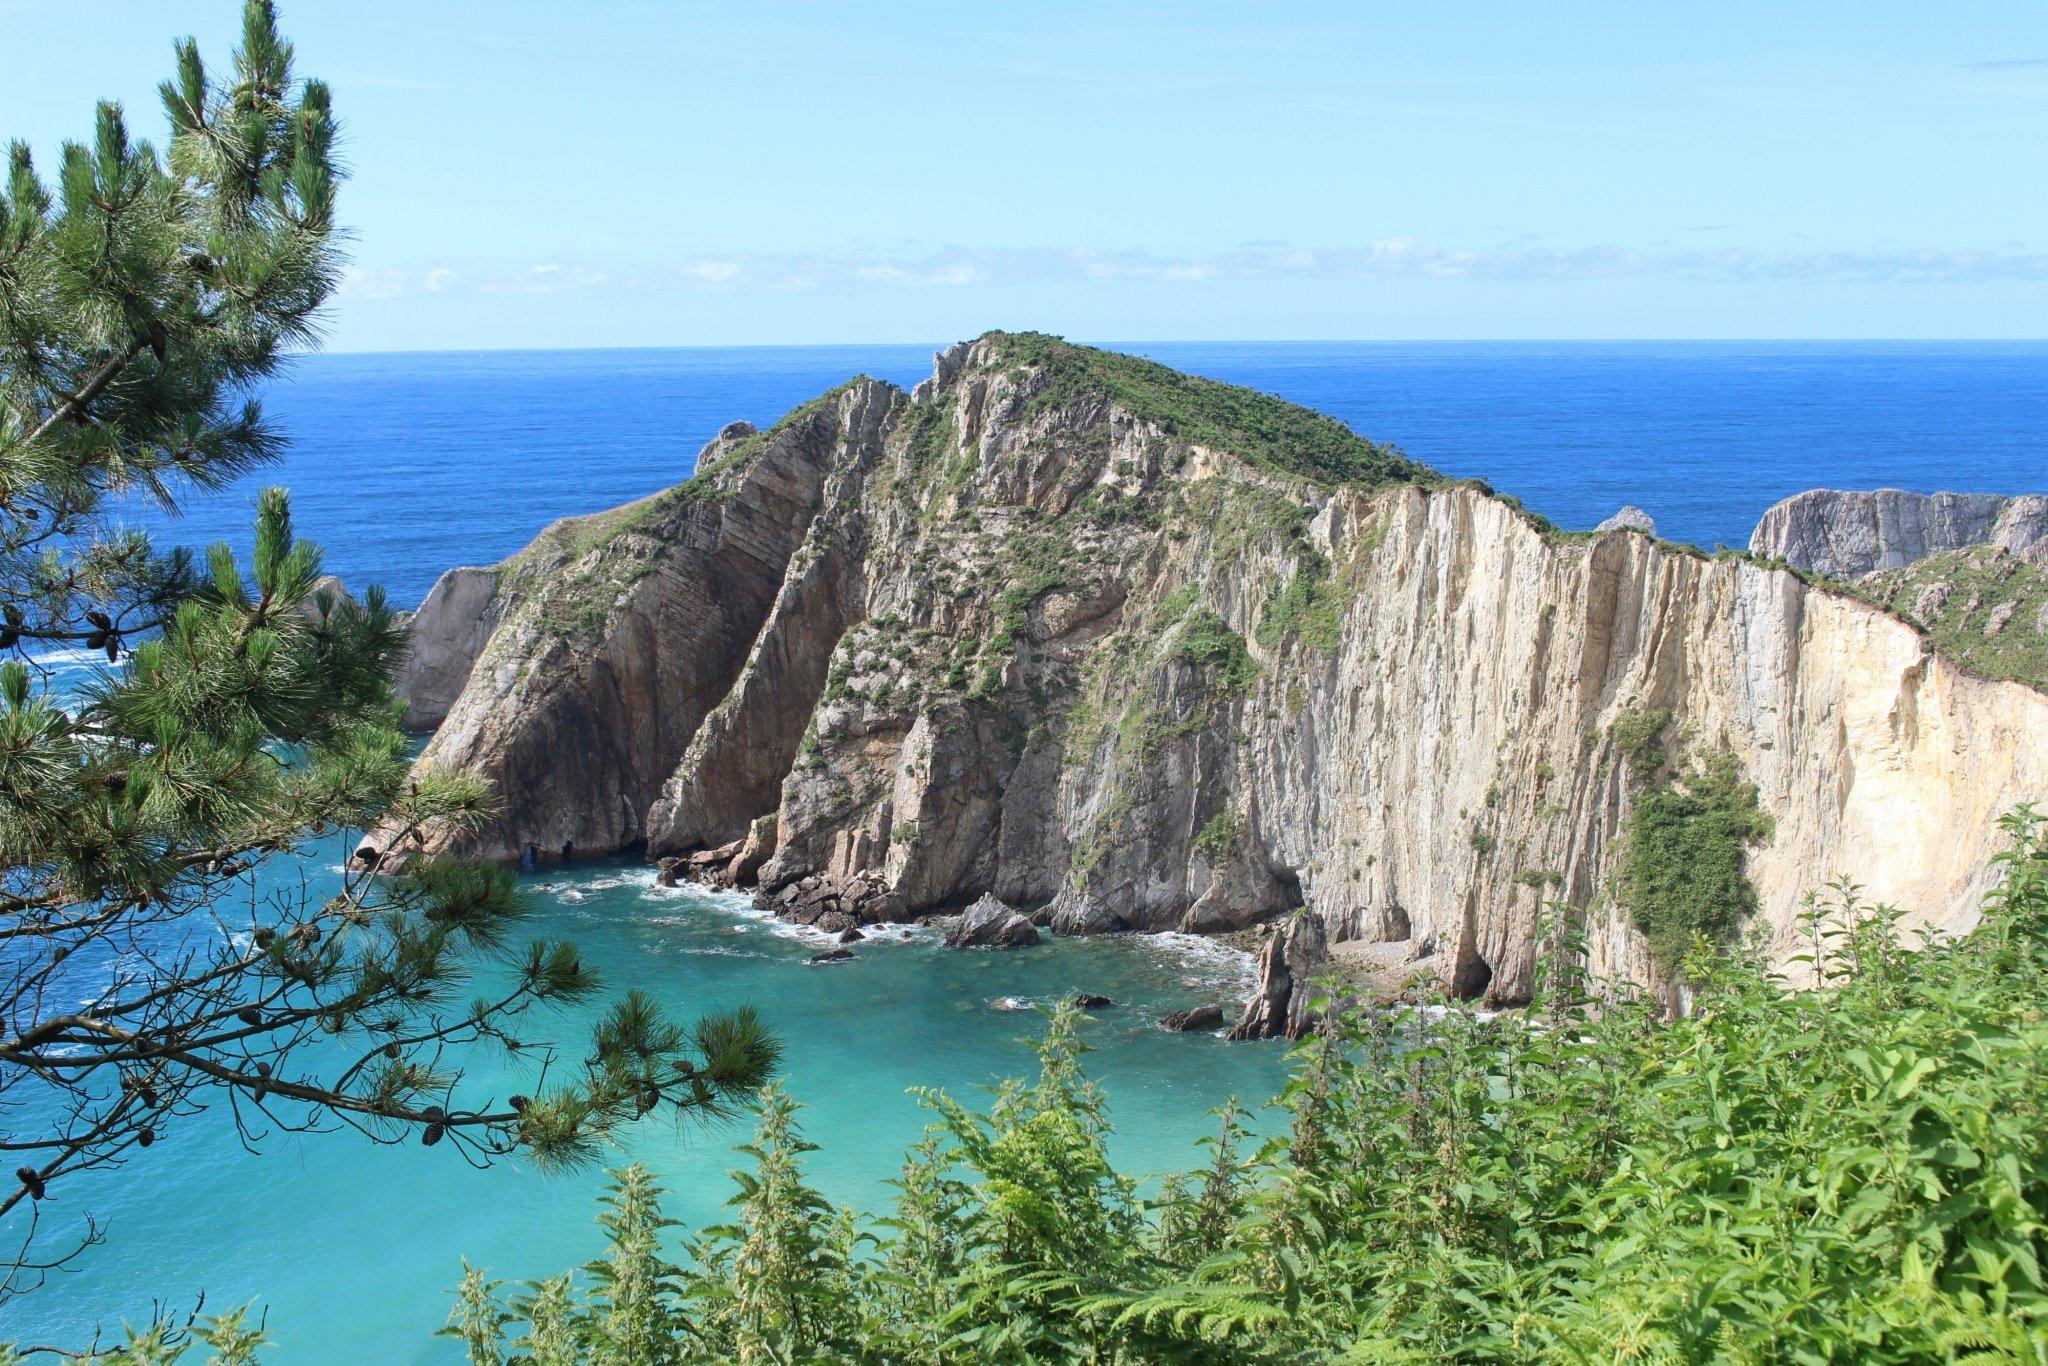 Northern Spain: 3 Beaches to Awaken Your Wanderlust